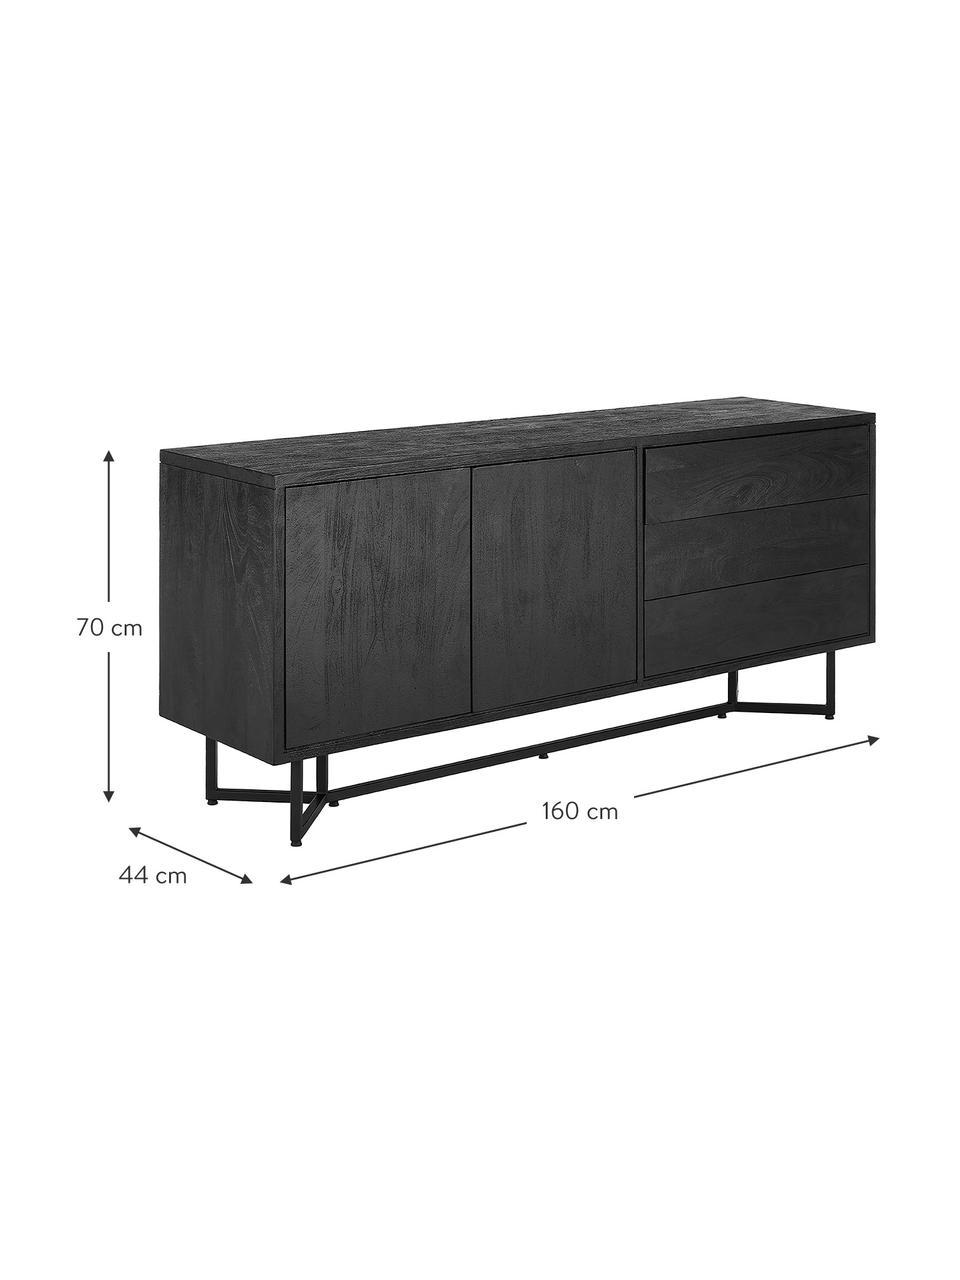 Schwarzes Sideboard Luca mit Türen aus Massivholz, Korpus: Massives Mangoholz, gebür, Gestell: Metall, pulverbeschichtet, Schwarz, 160 x 70 cm